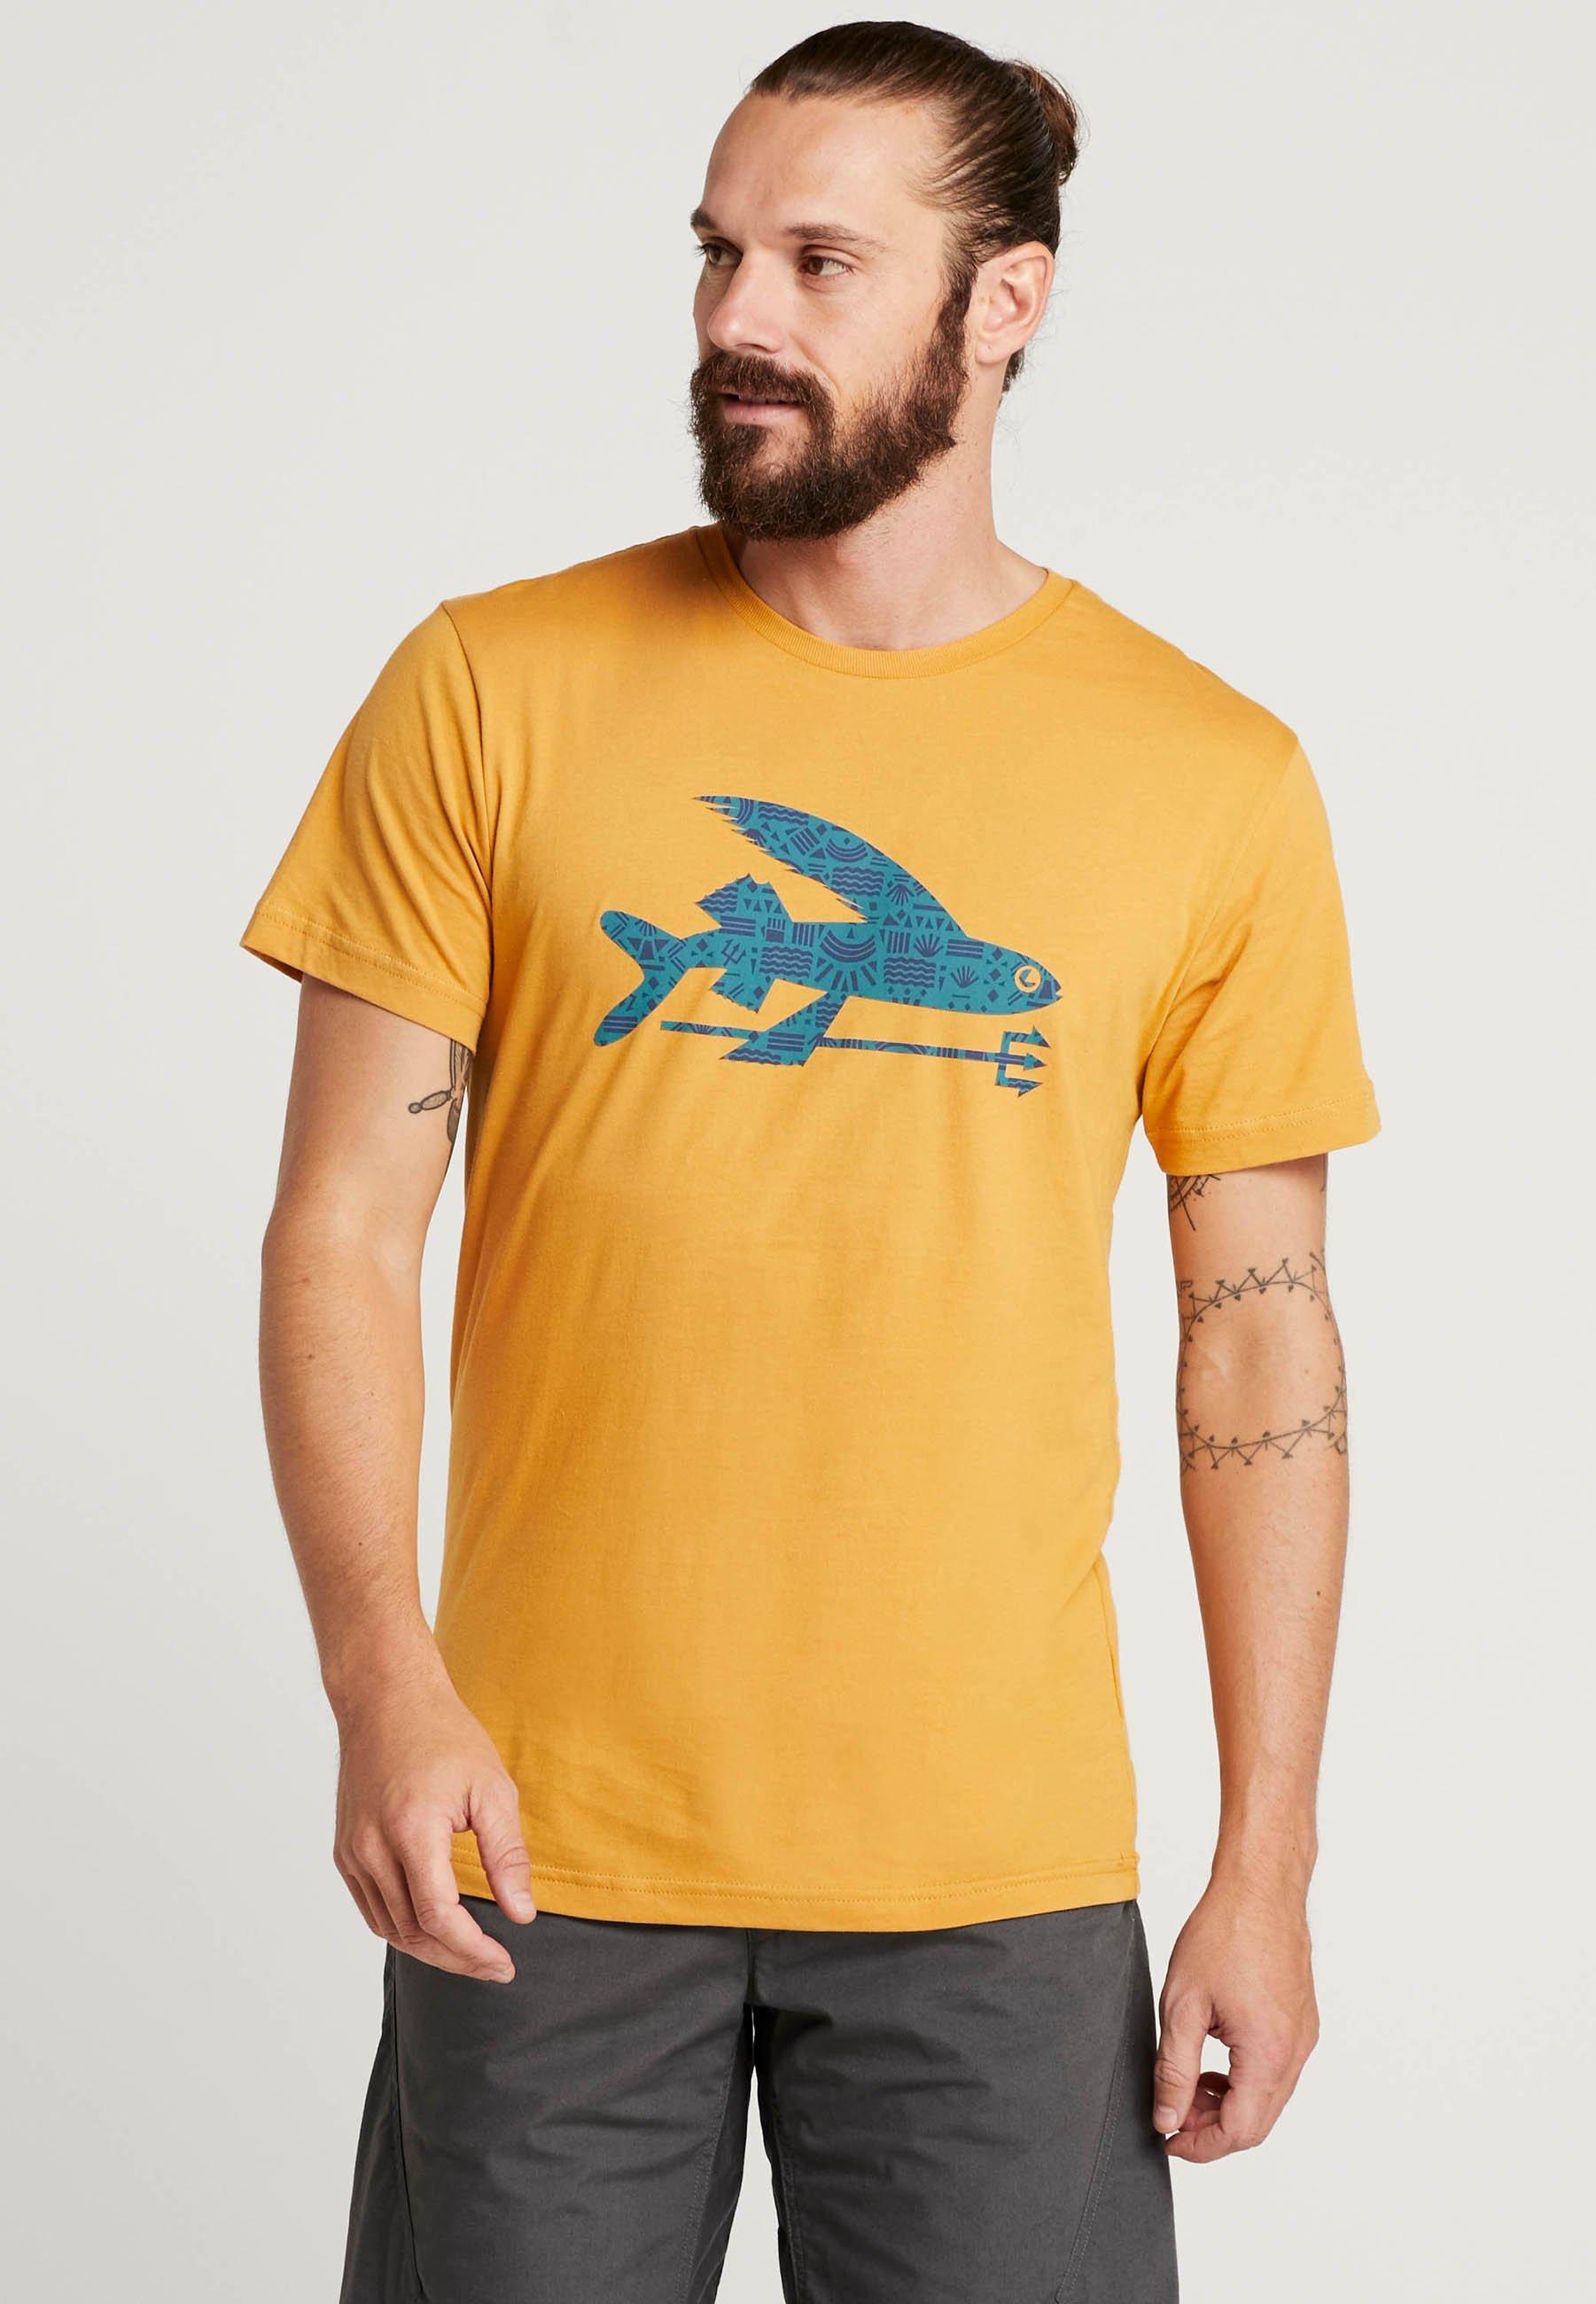 shirt Flying Glyph Imprimé Patagonia Gold FishT SpzMUqGLV